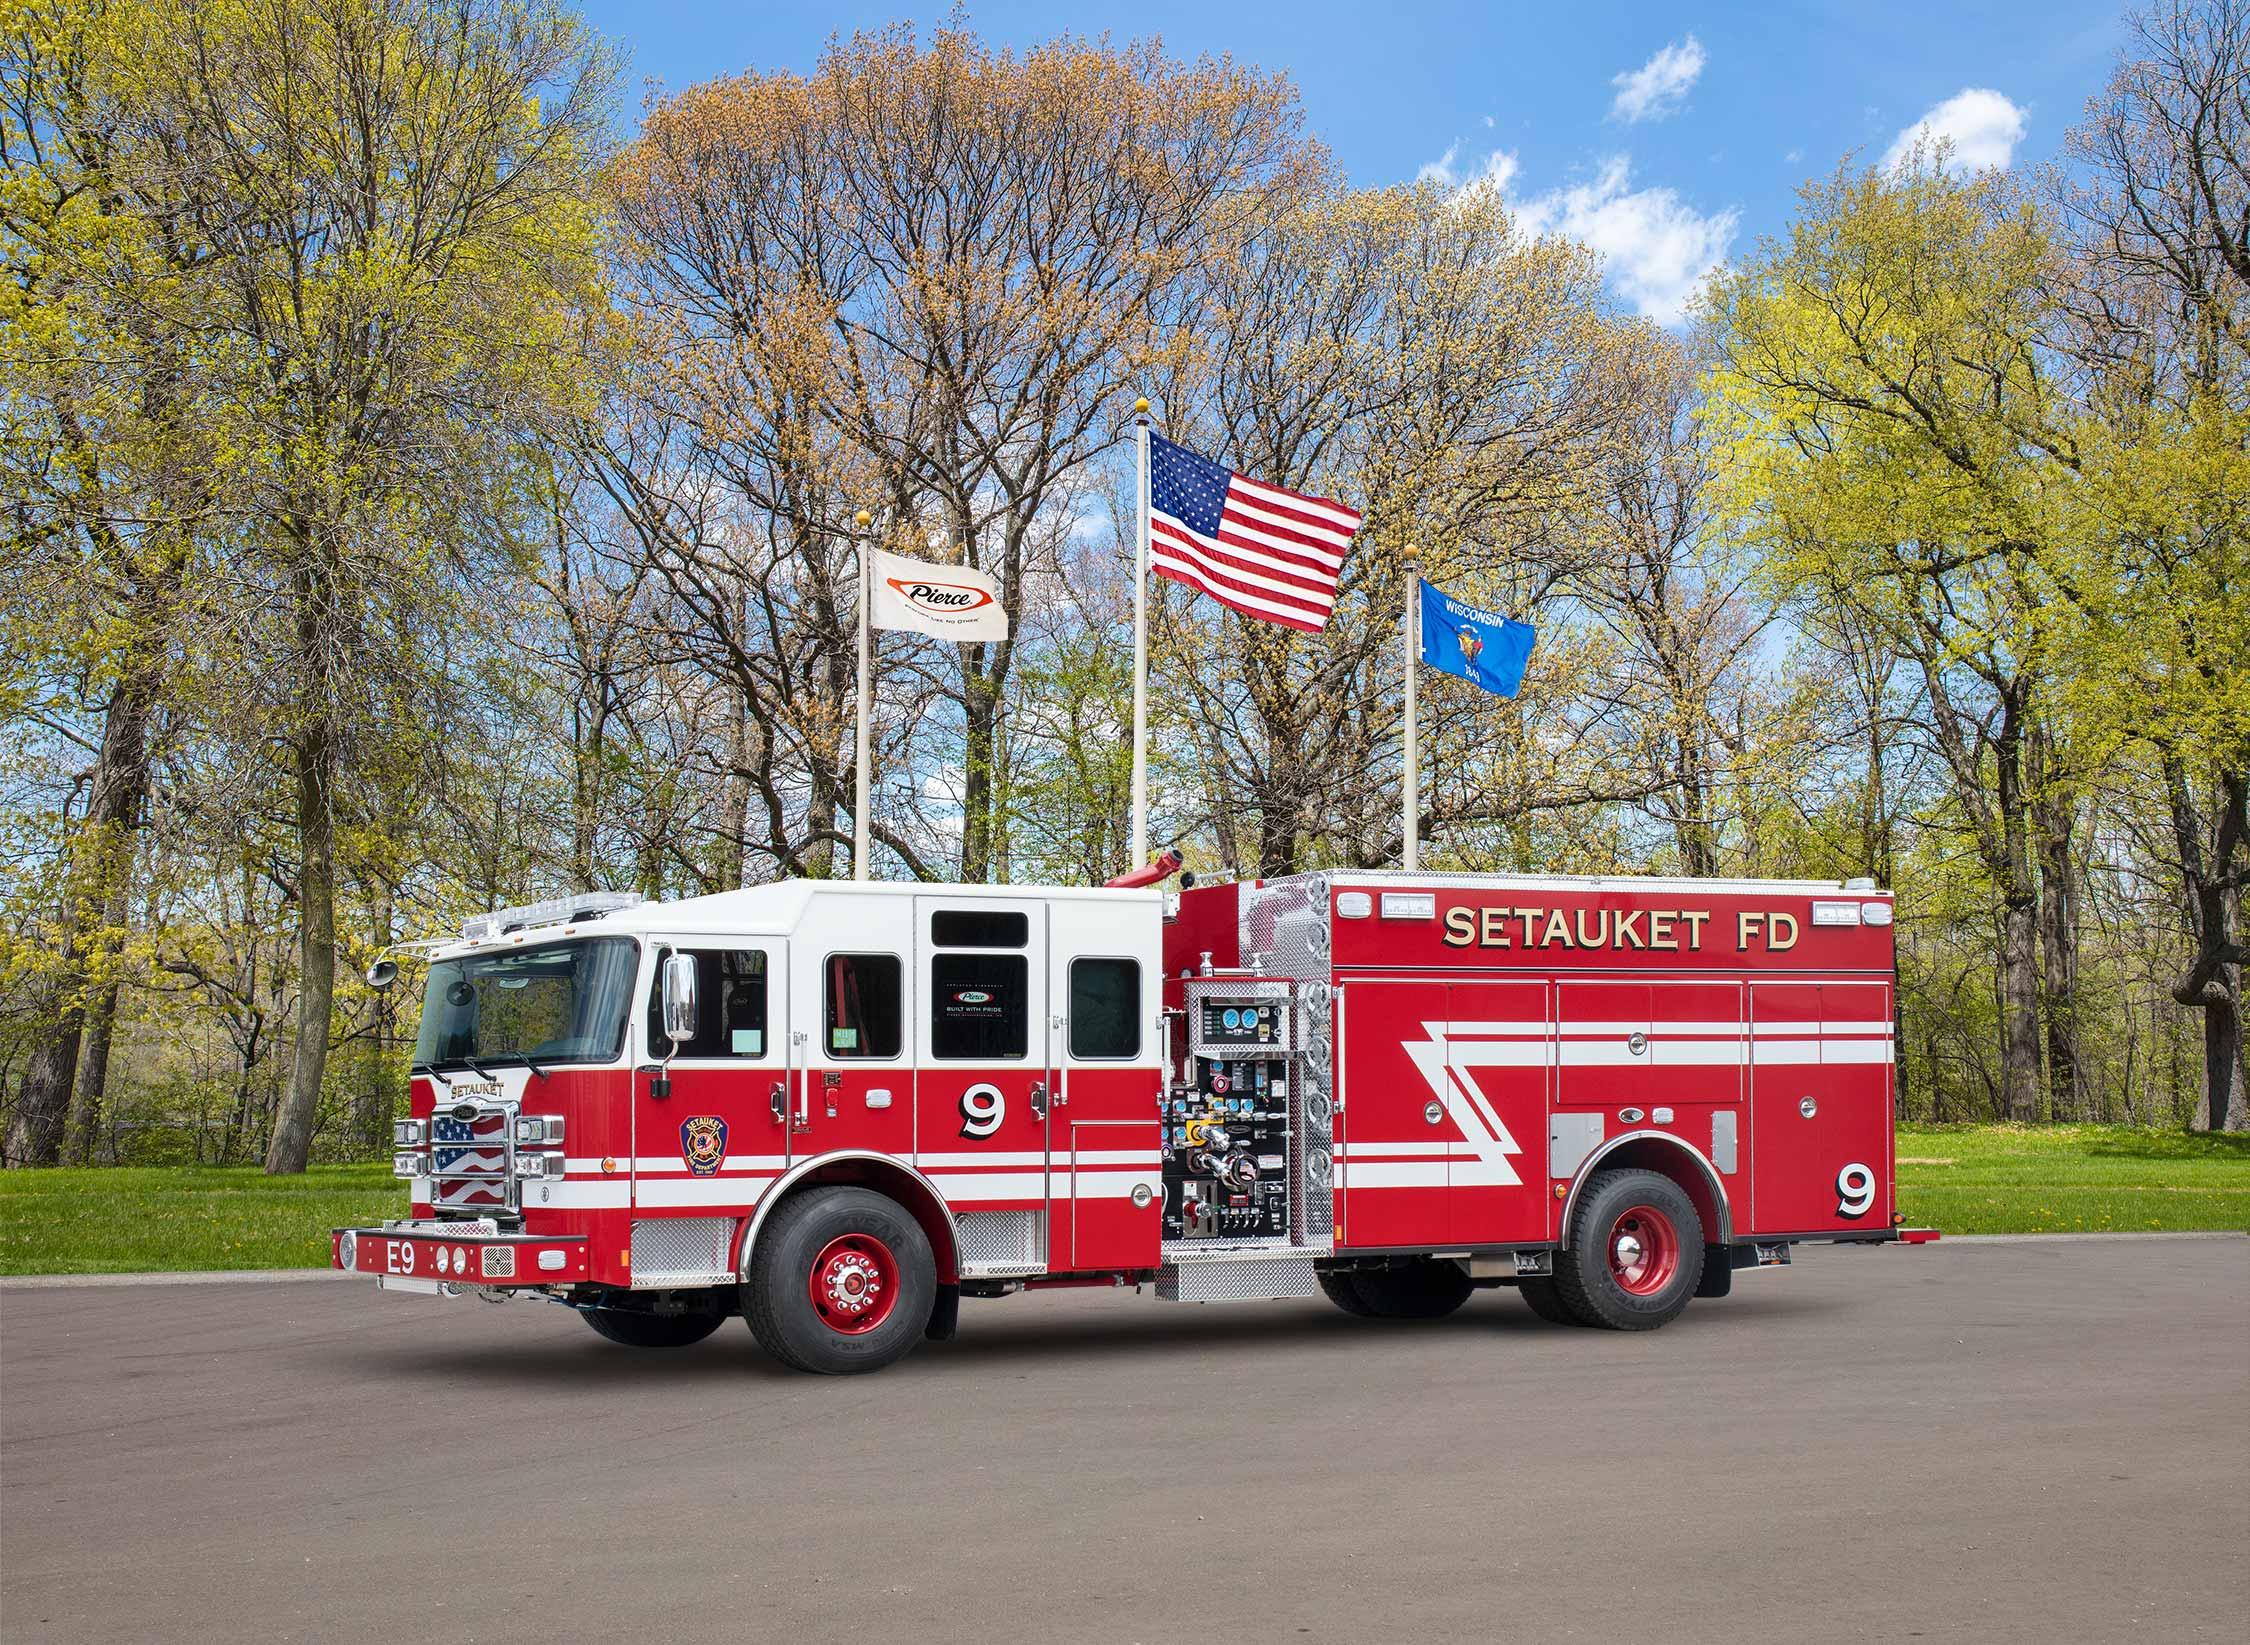 Setauket Fire Department - Pumper